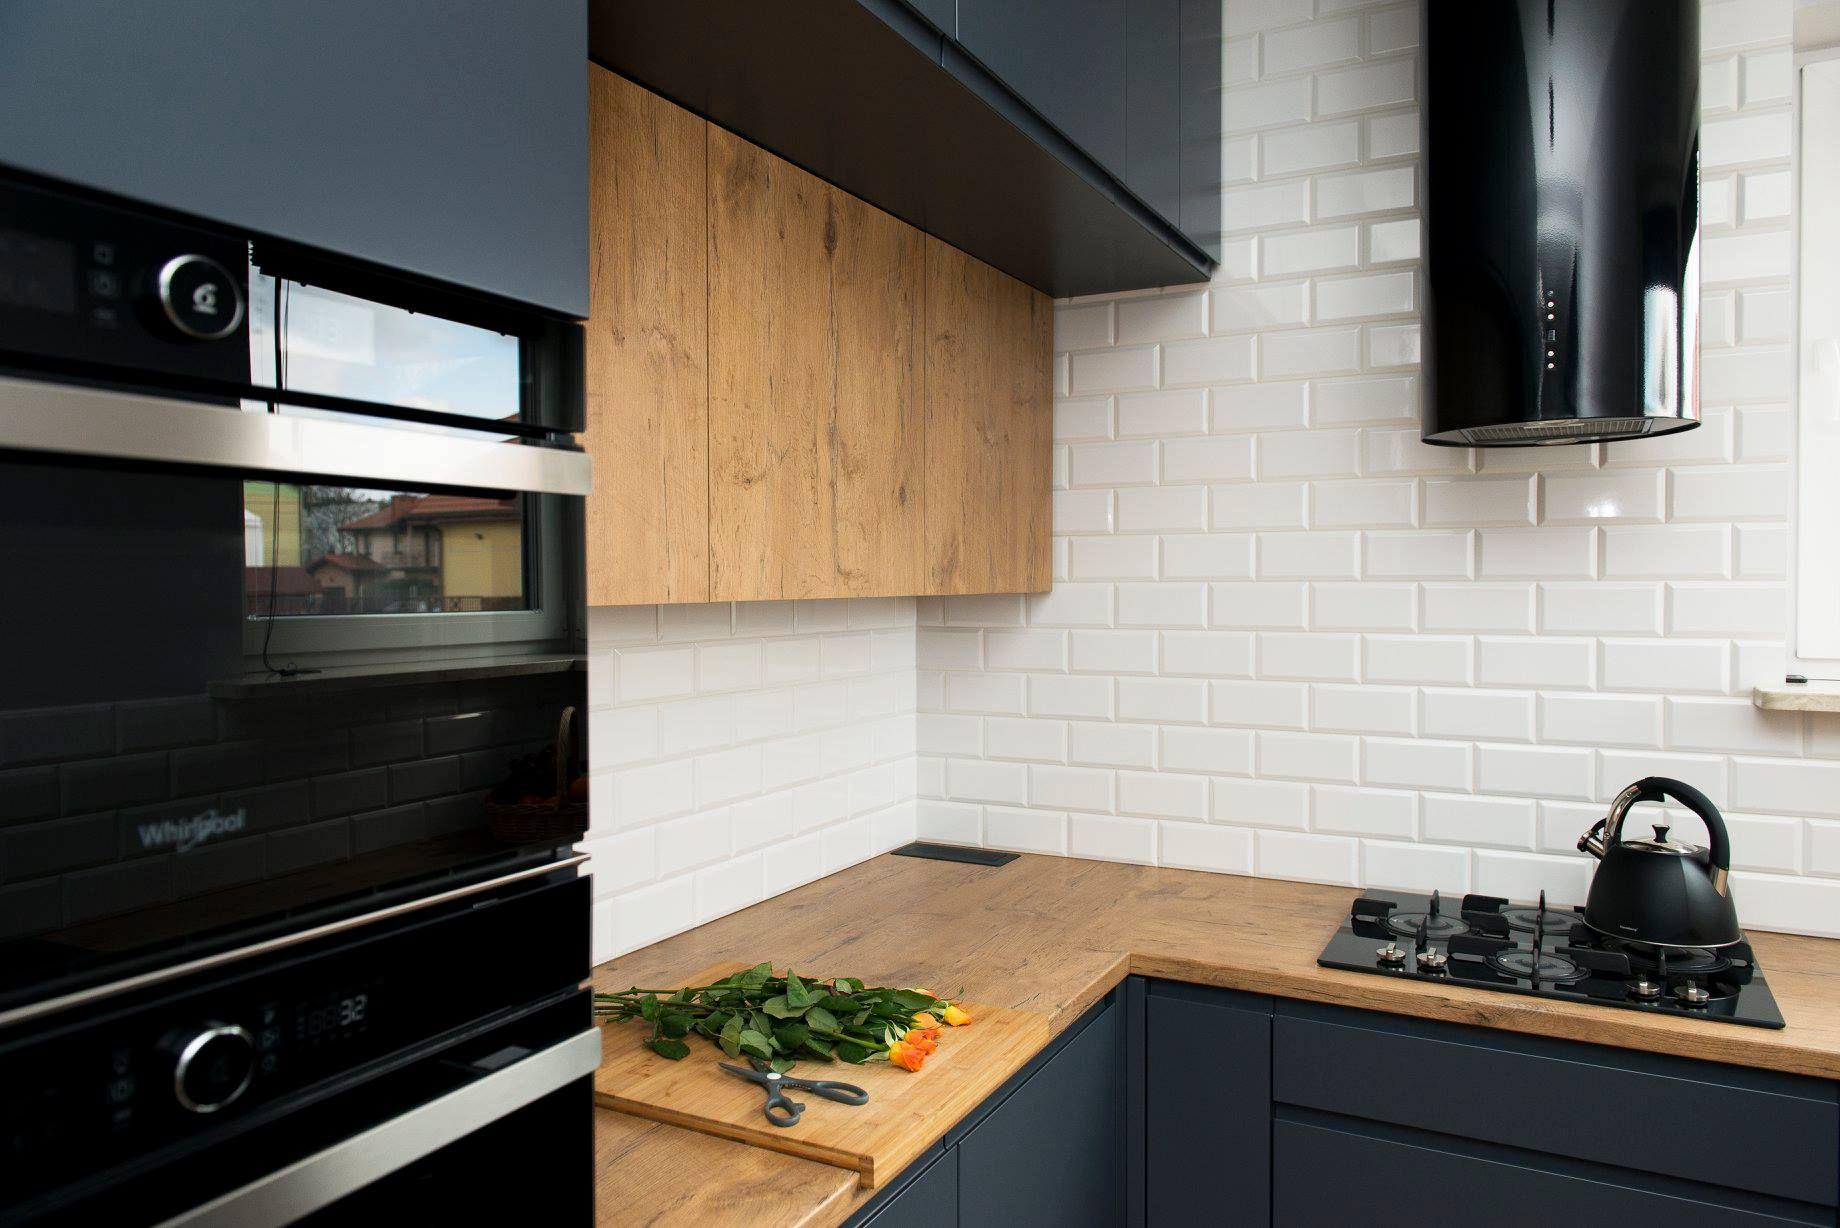 Okap Kominowy Cylindro Or Black Nortberg In 2021 Kitchen Design Kitchen Design Small Modern Kitchen